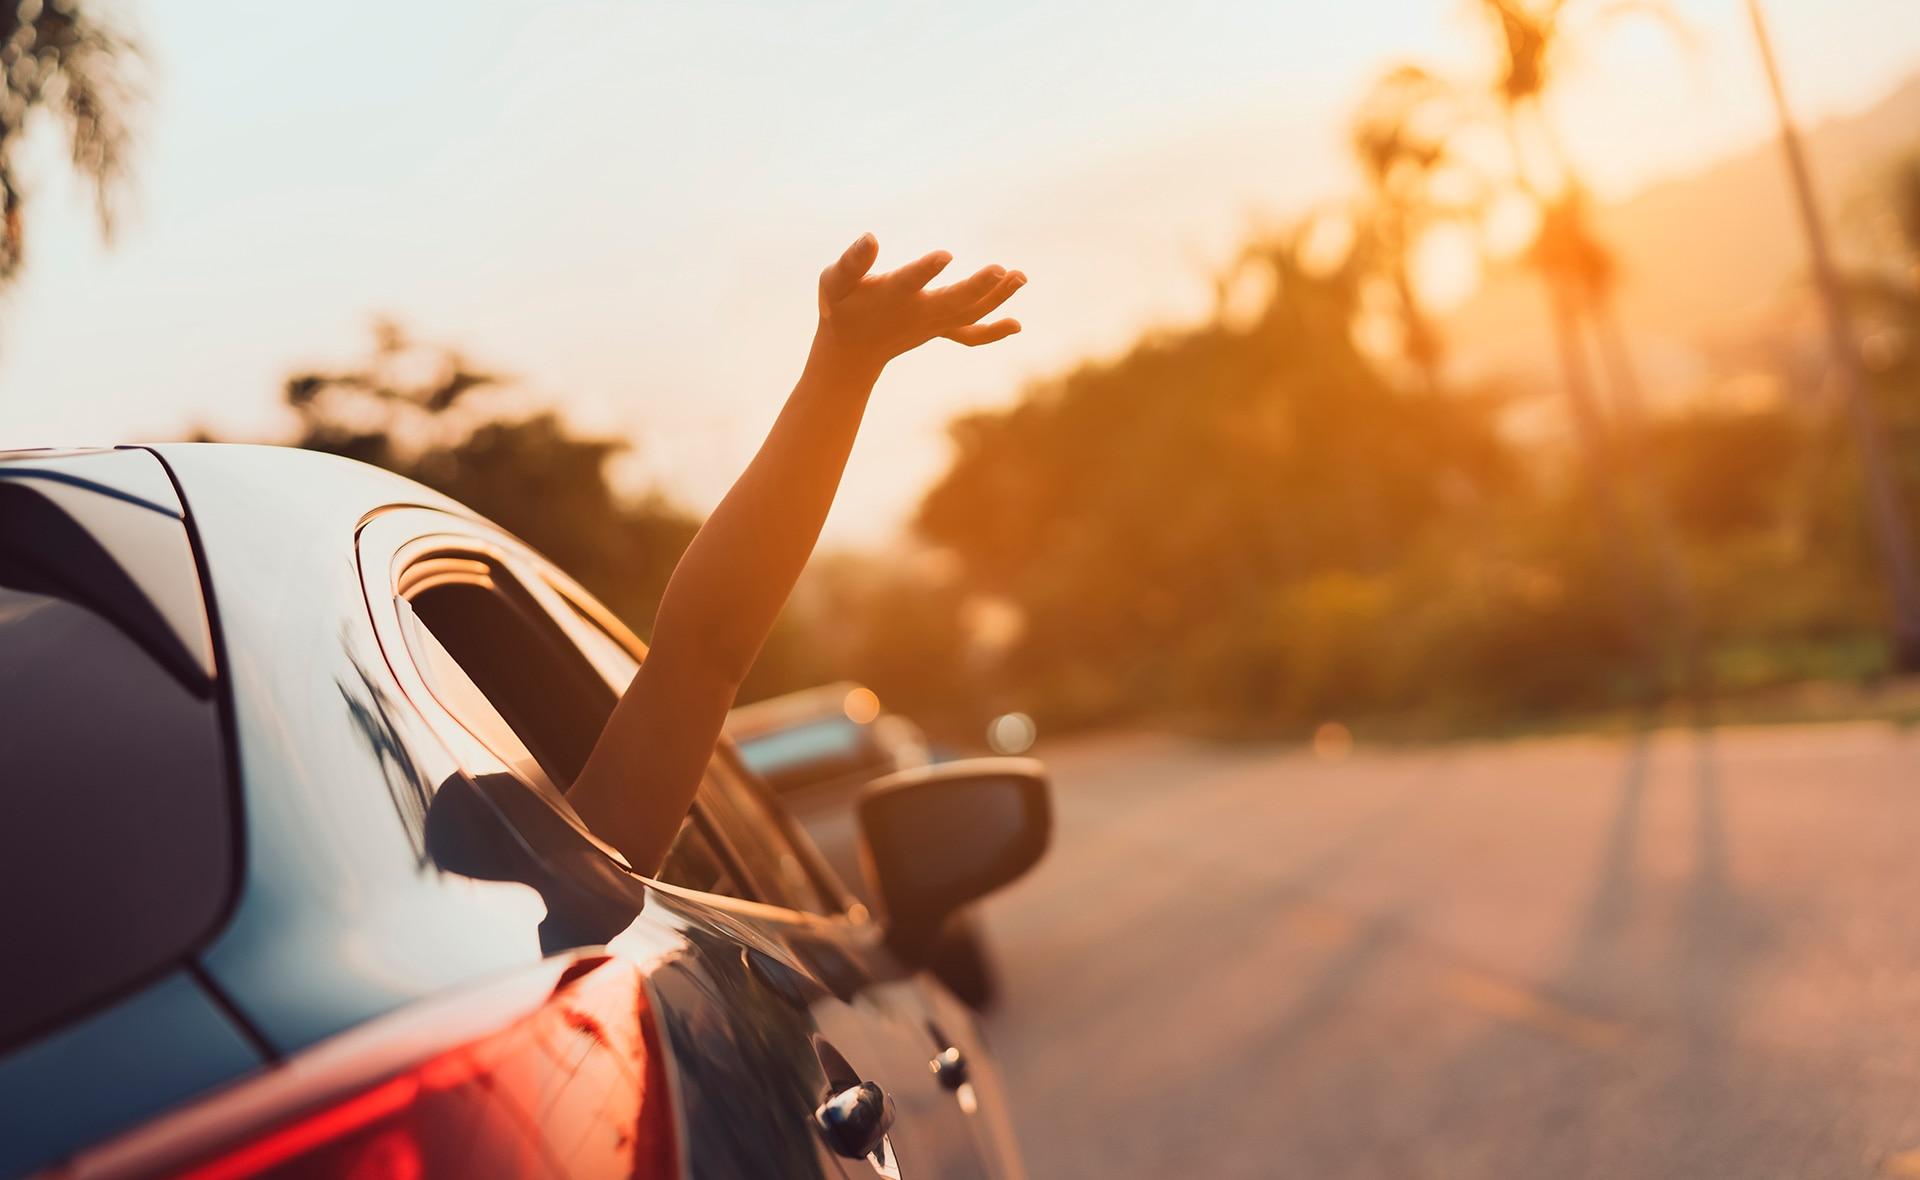 BBVA-car_sharing-movilidad-sostenible-vehiculos